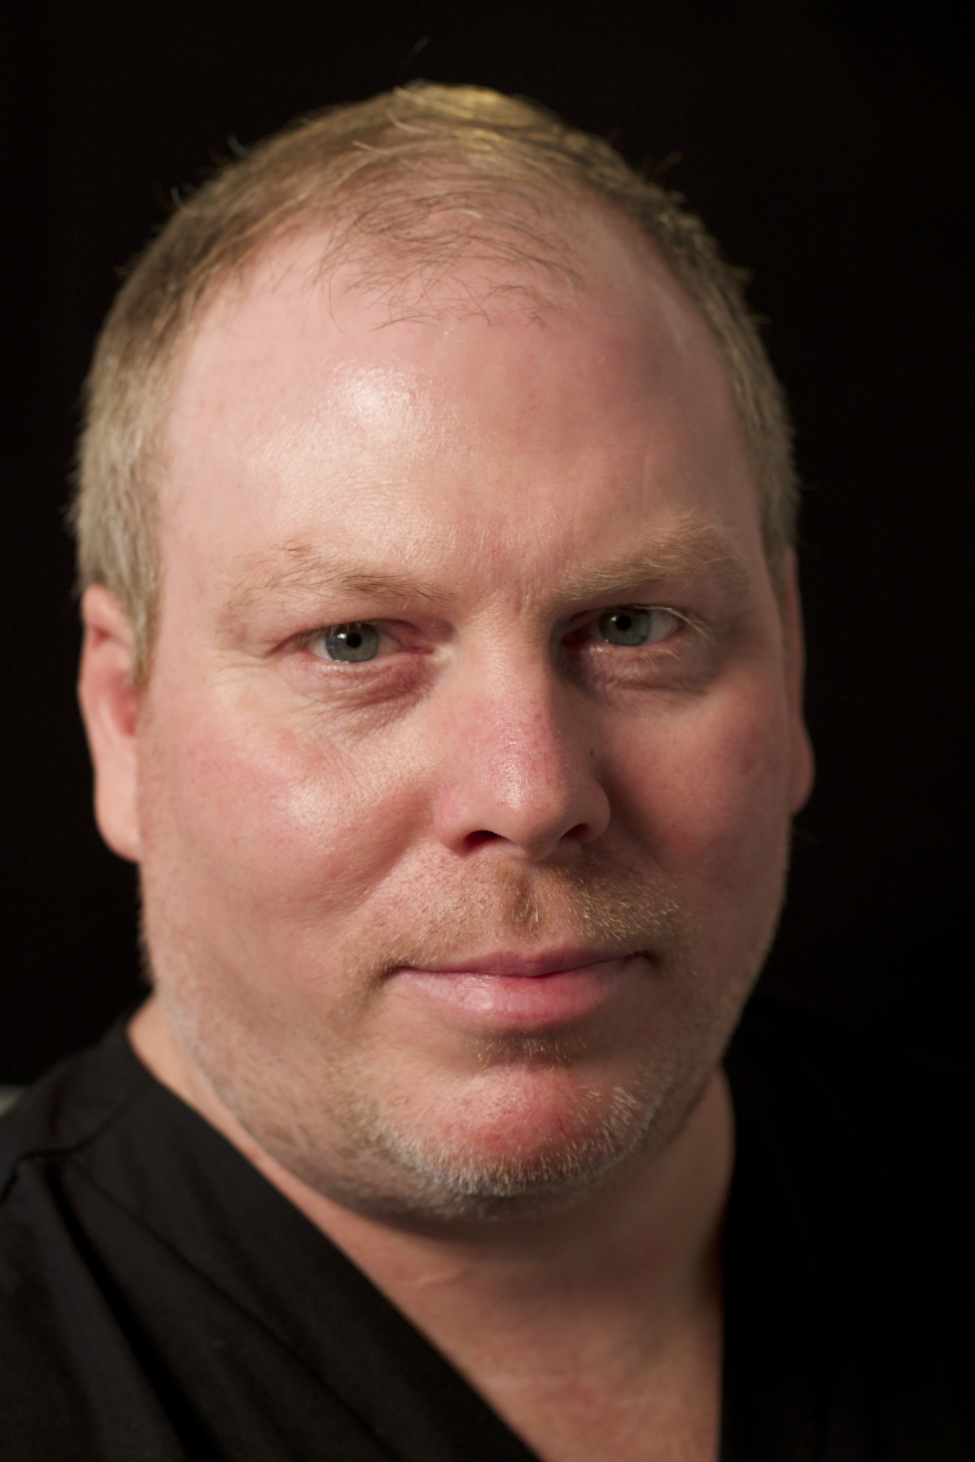 Dennis Grah: EMG Technician